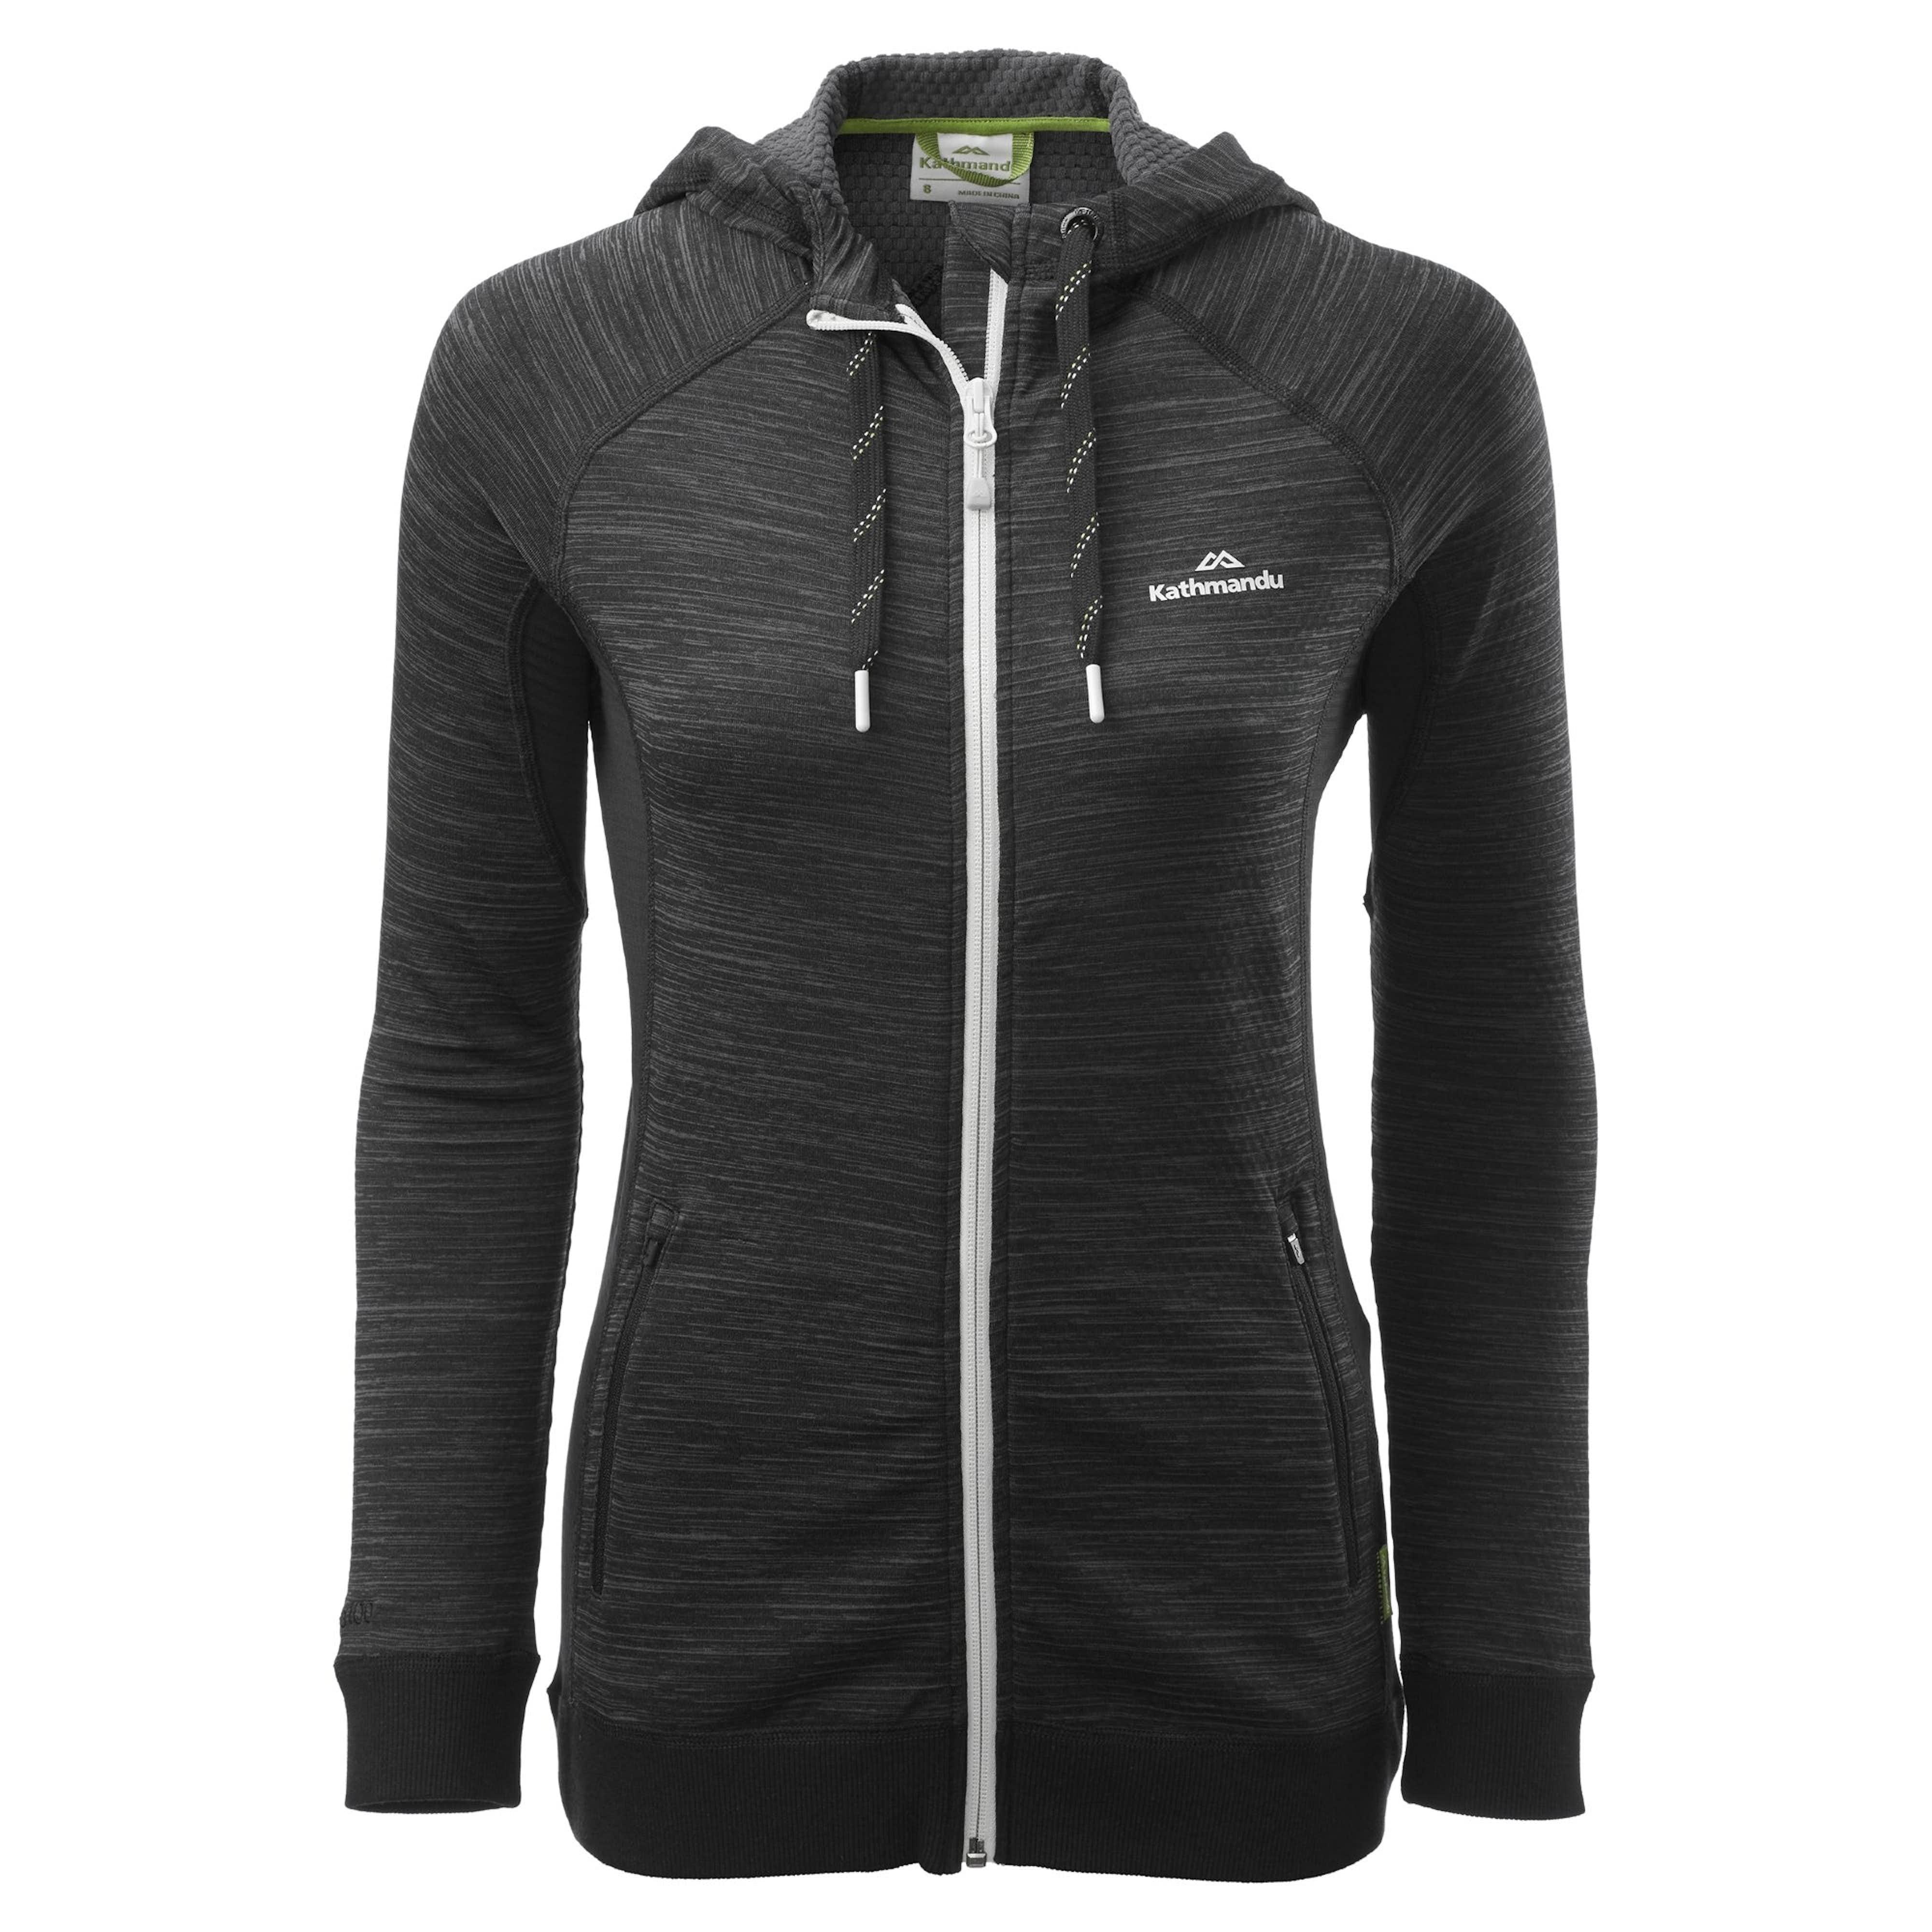 Acota women 39 s hooded fleece jacket for Handy heater italia opinioni